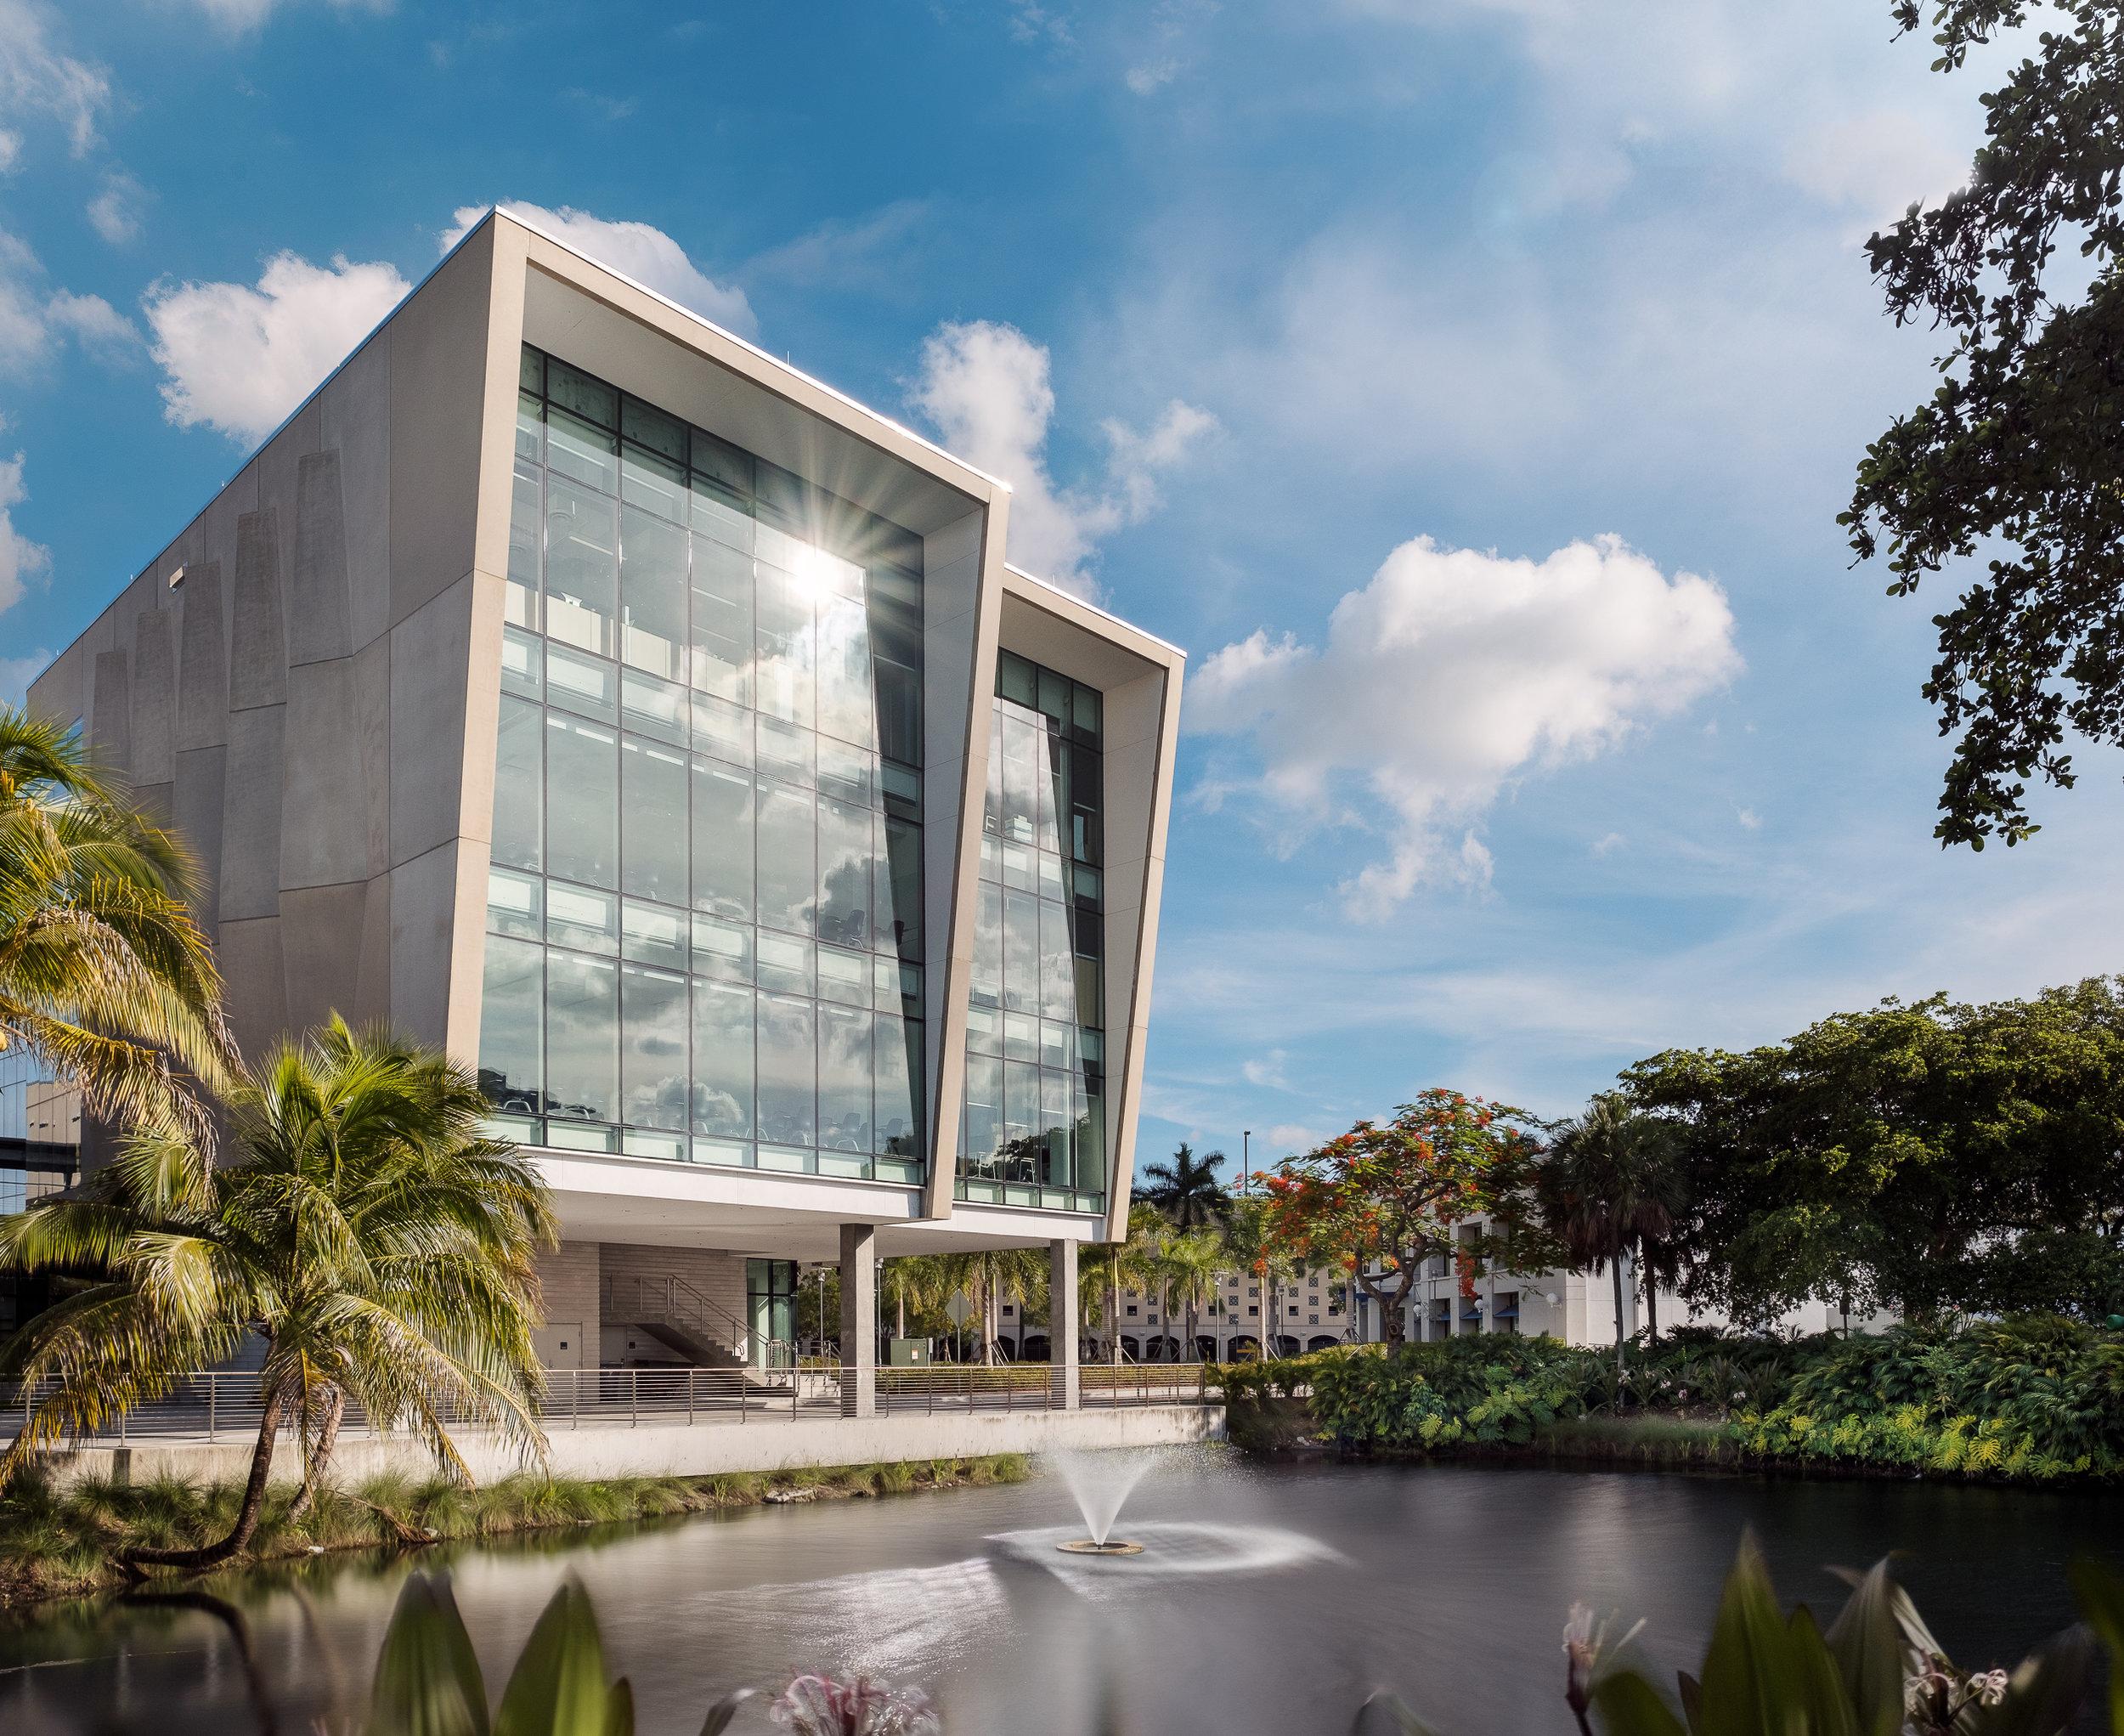 Florida Int'l University Student Academic Center: Miami, FL